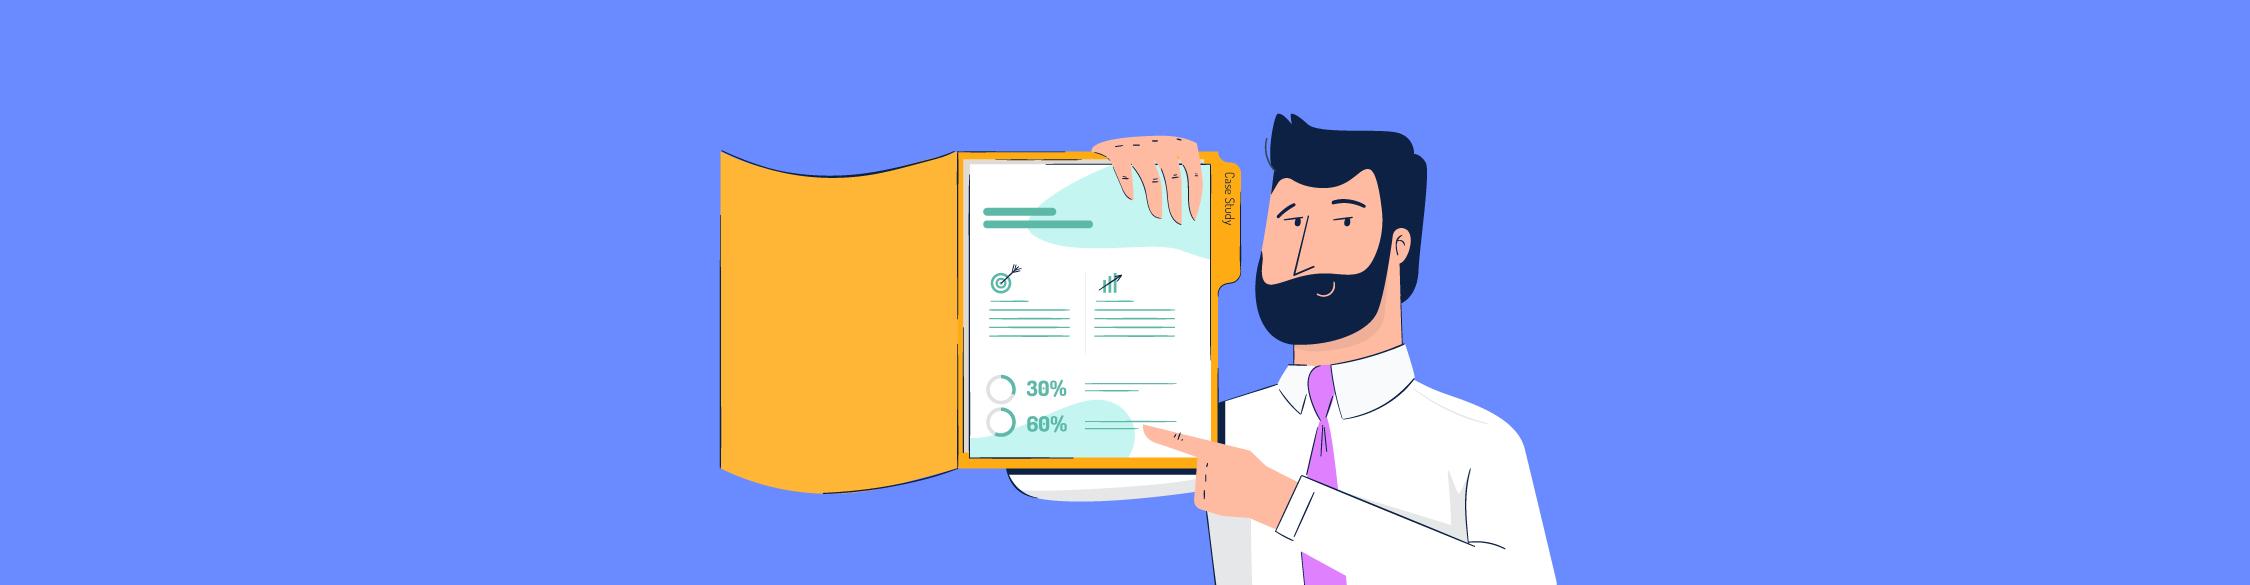 An illustration of a man pointing to a case study inside a manila folder.